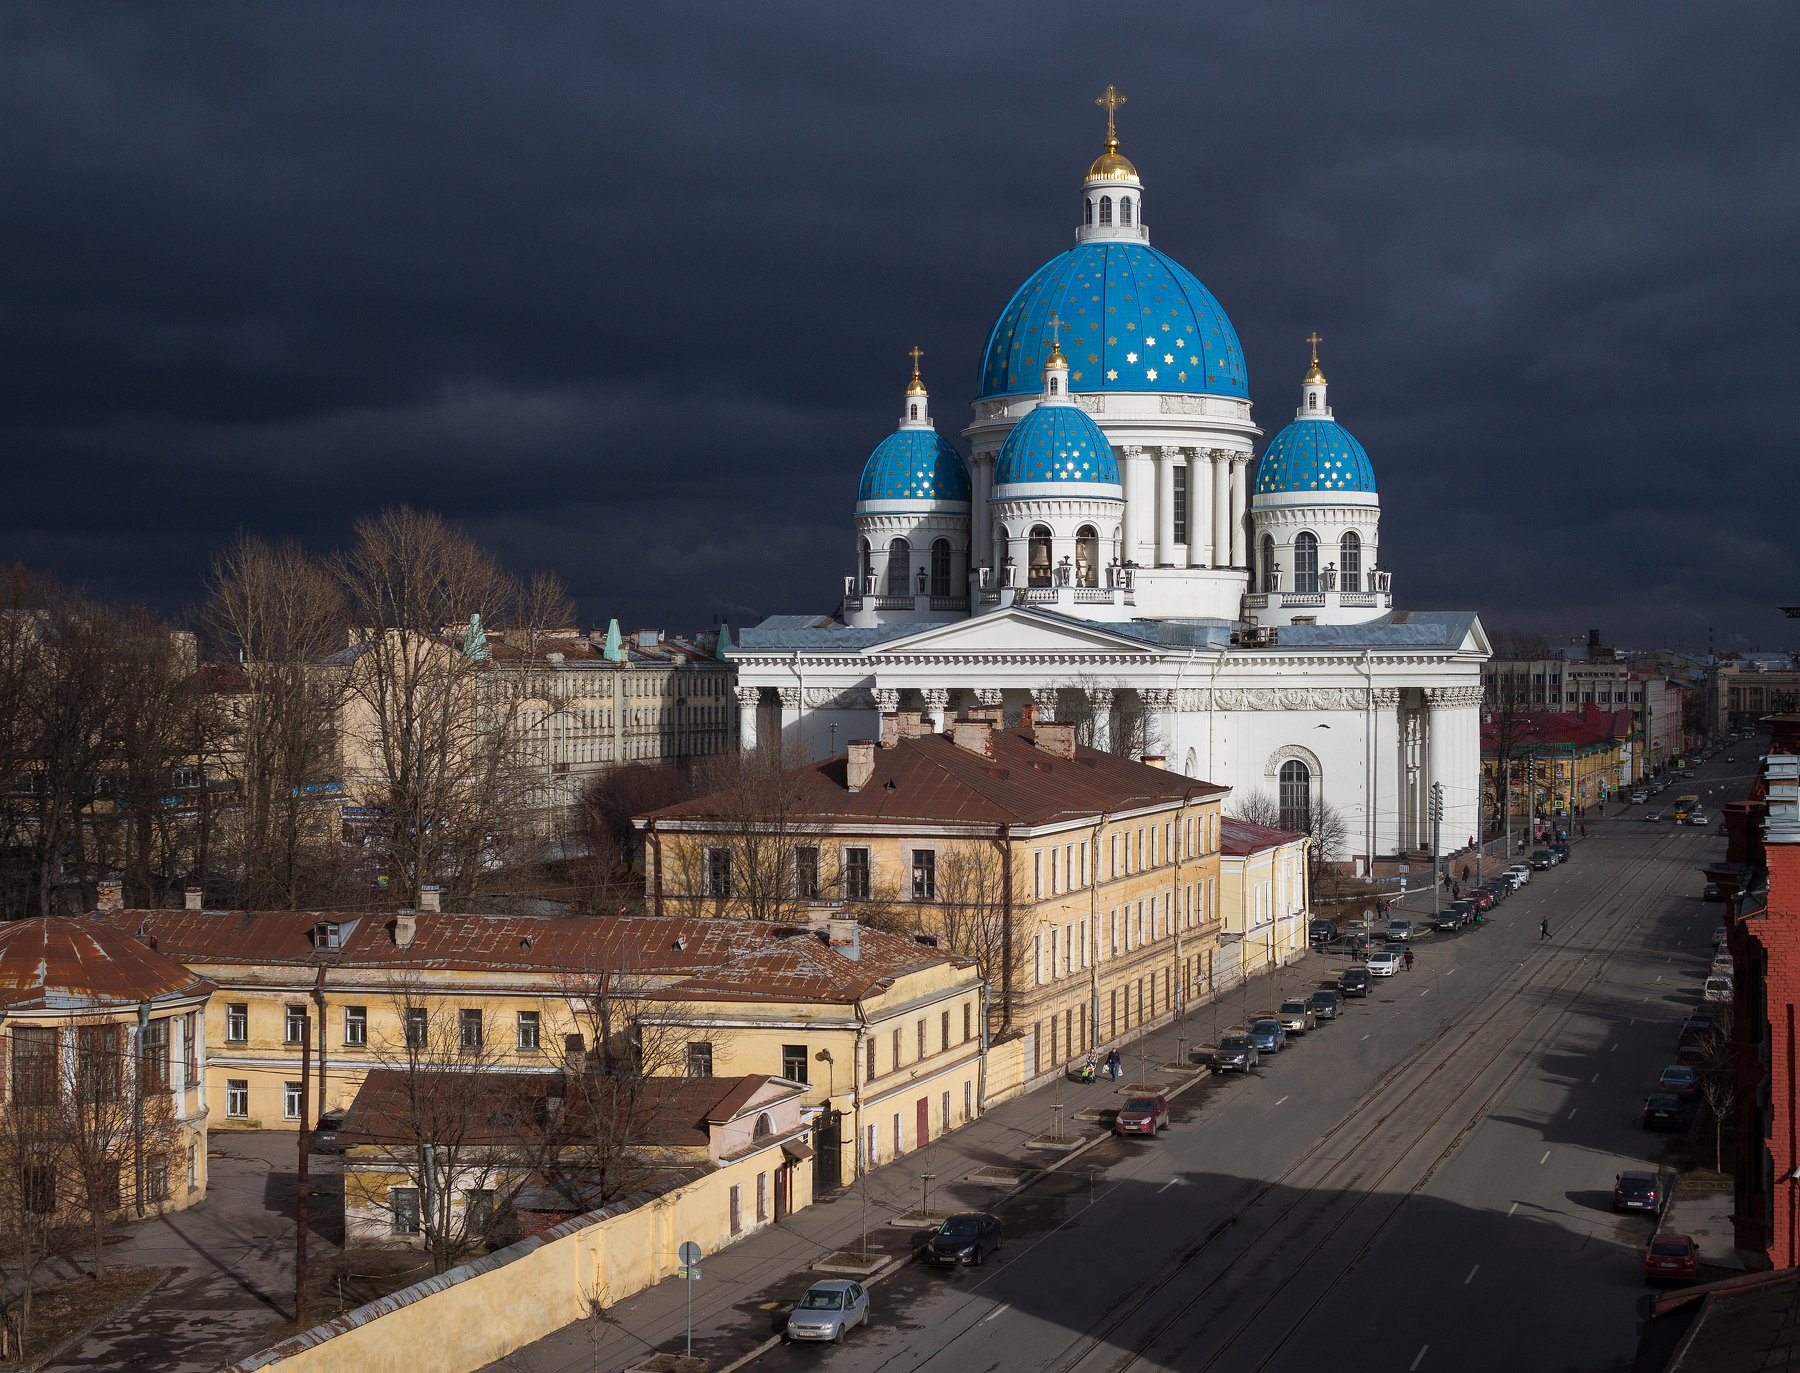 Cityscape, urban exploration, roof, church, cathedral, Голубев Алексей